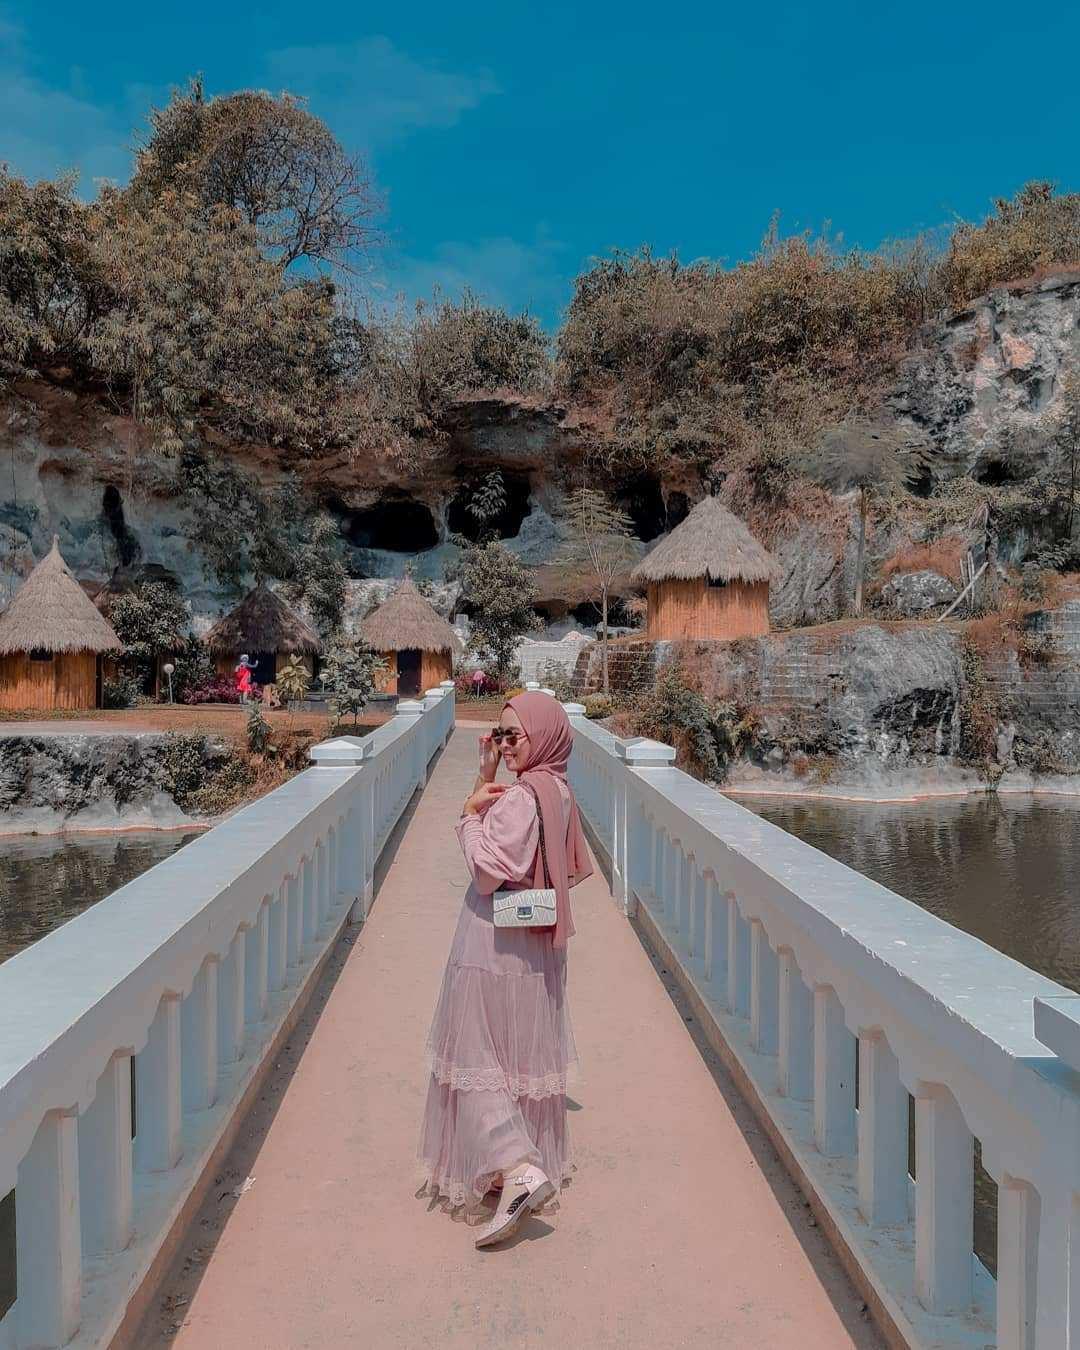 Jembatan di Wisata Setigi Gresik image From @anggun_aayuirn